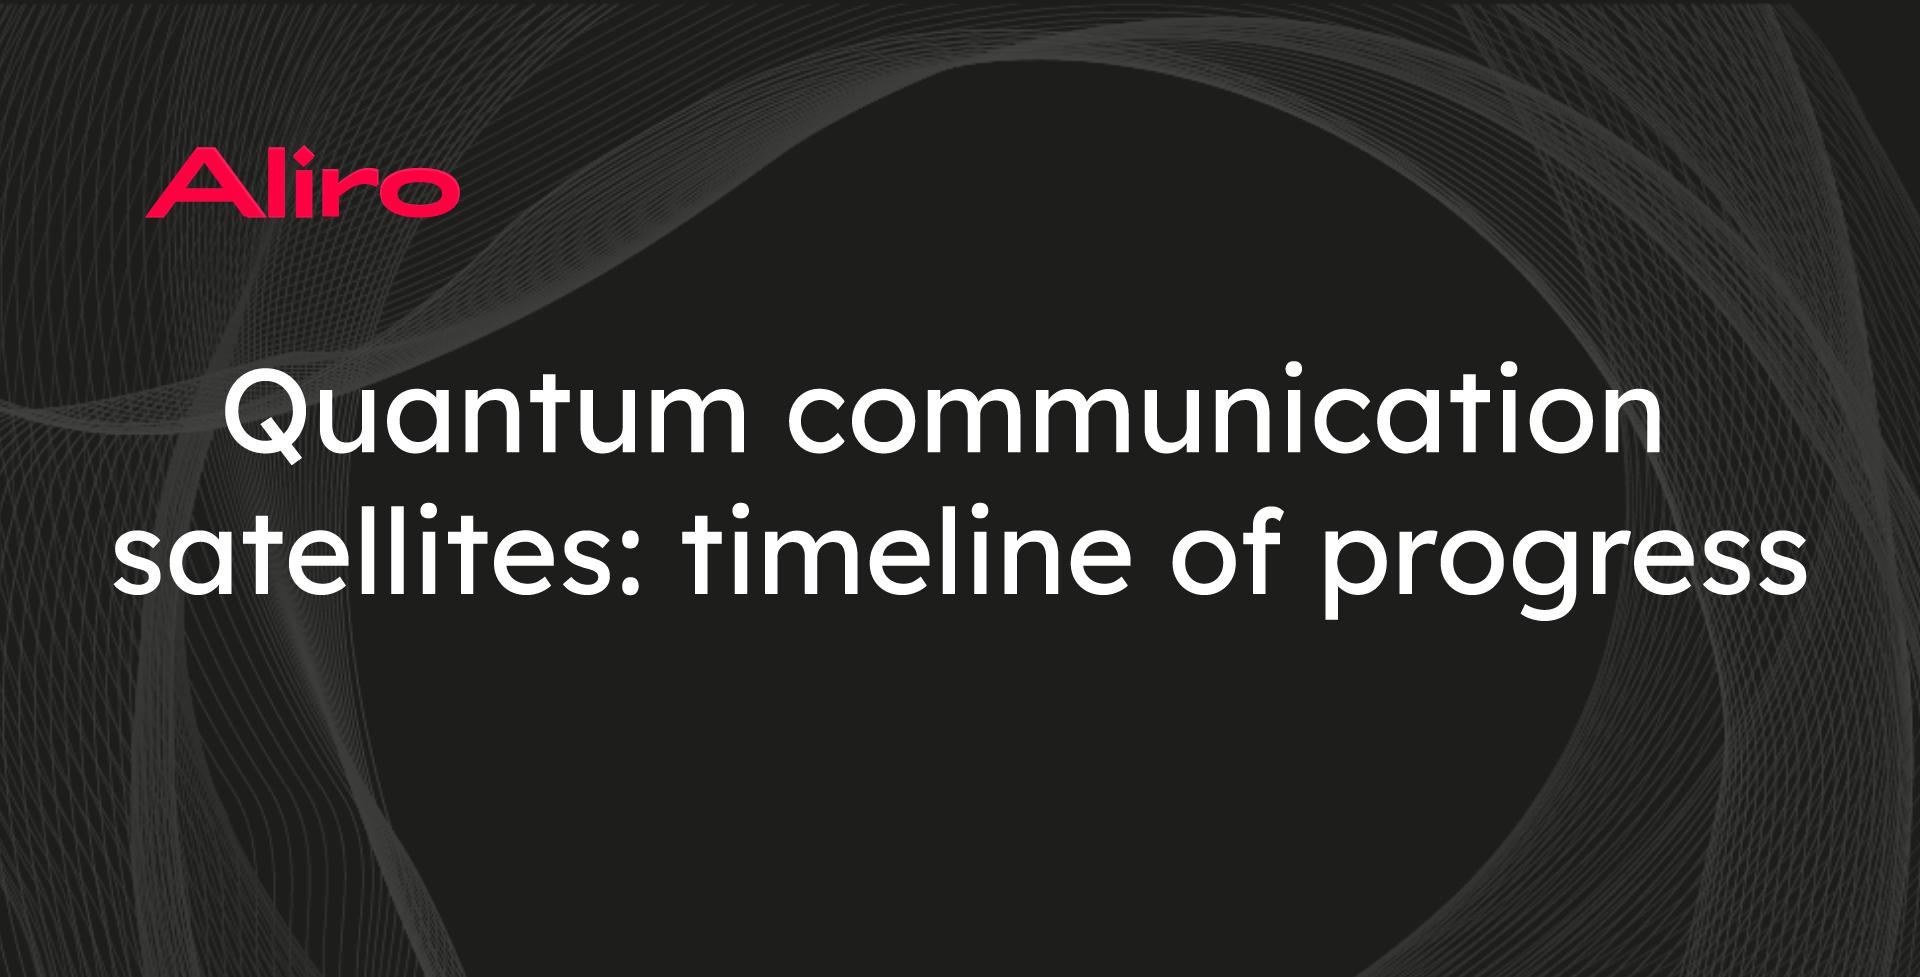 Quantum communication satellites: timeline of progress